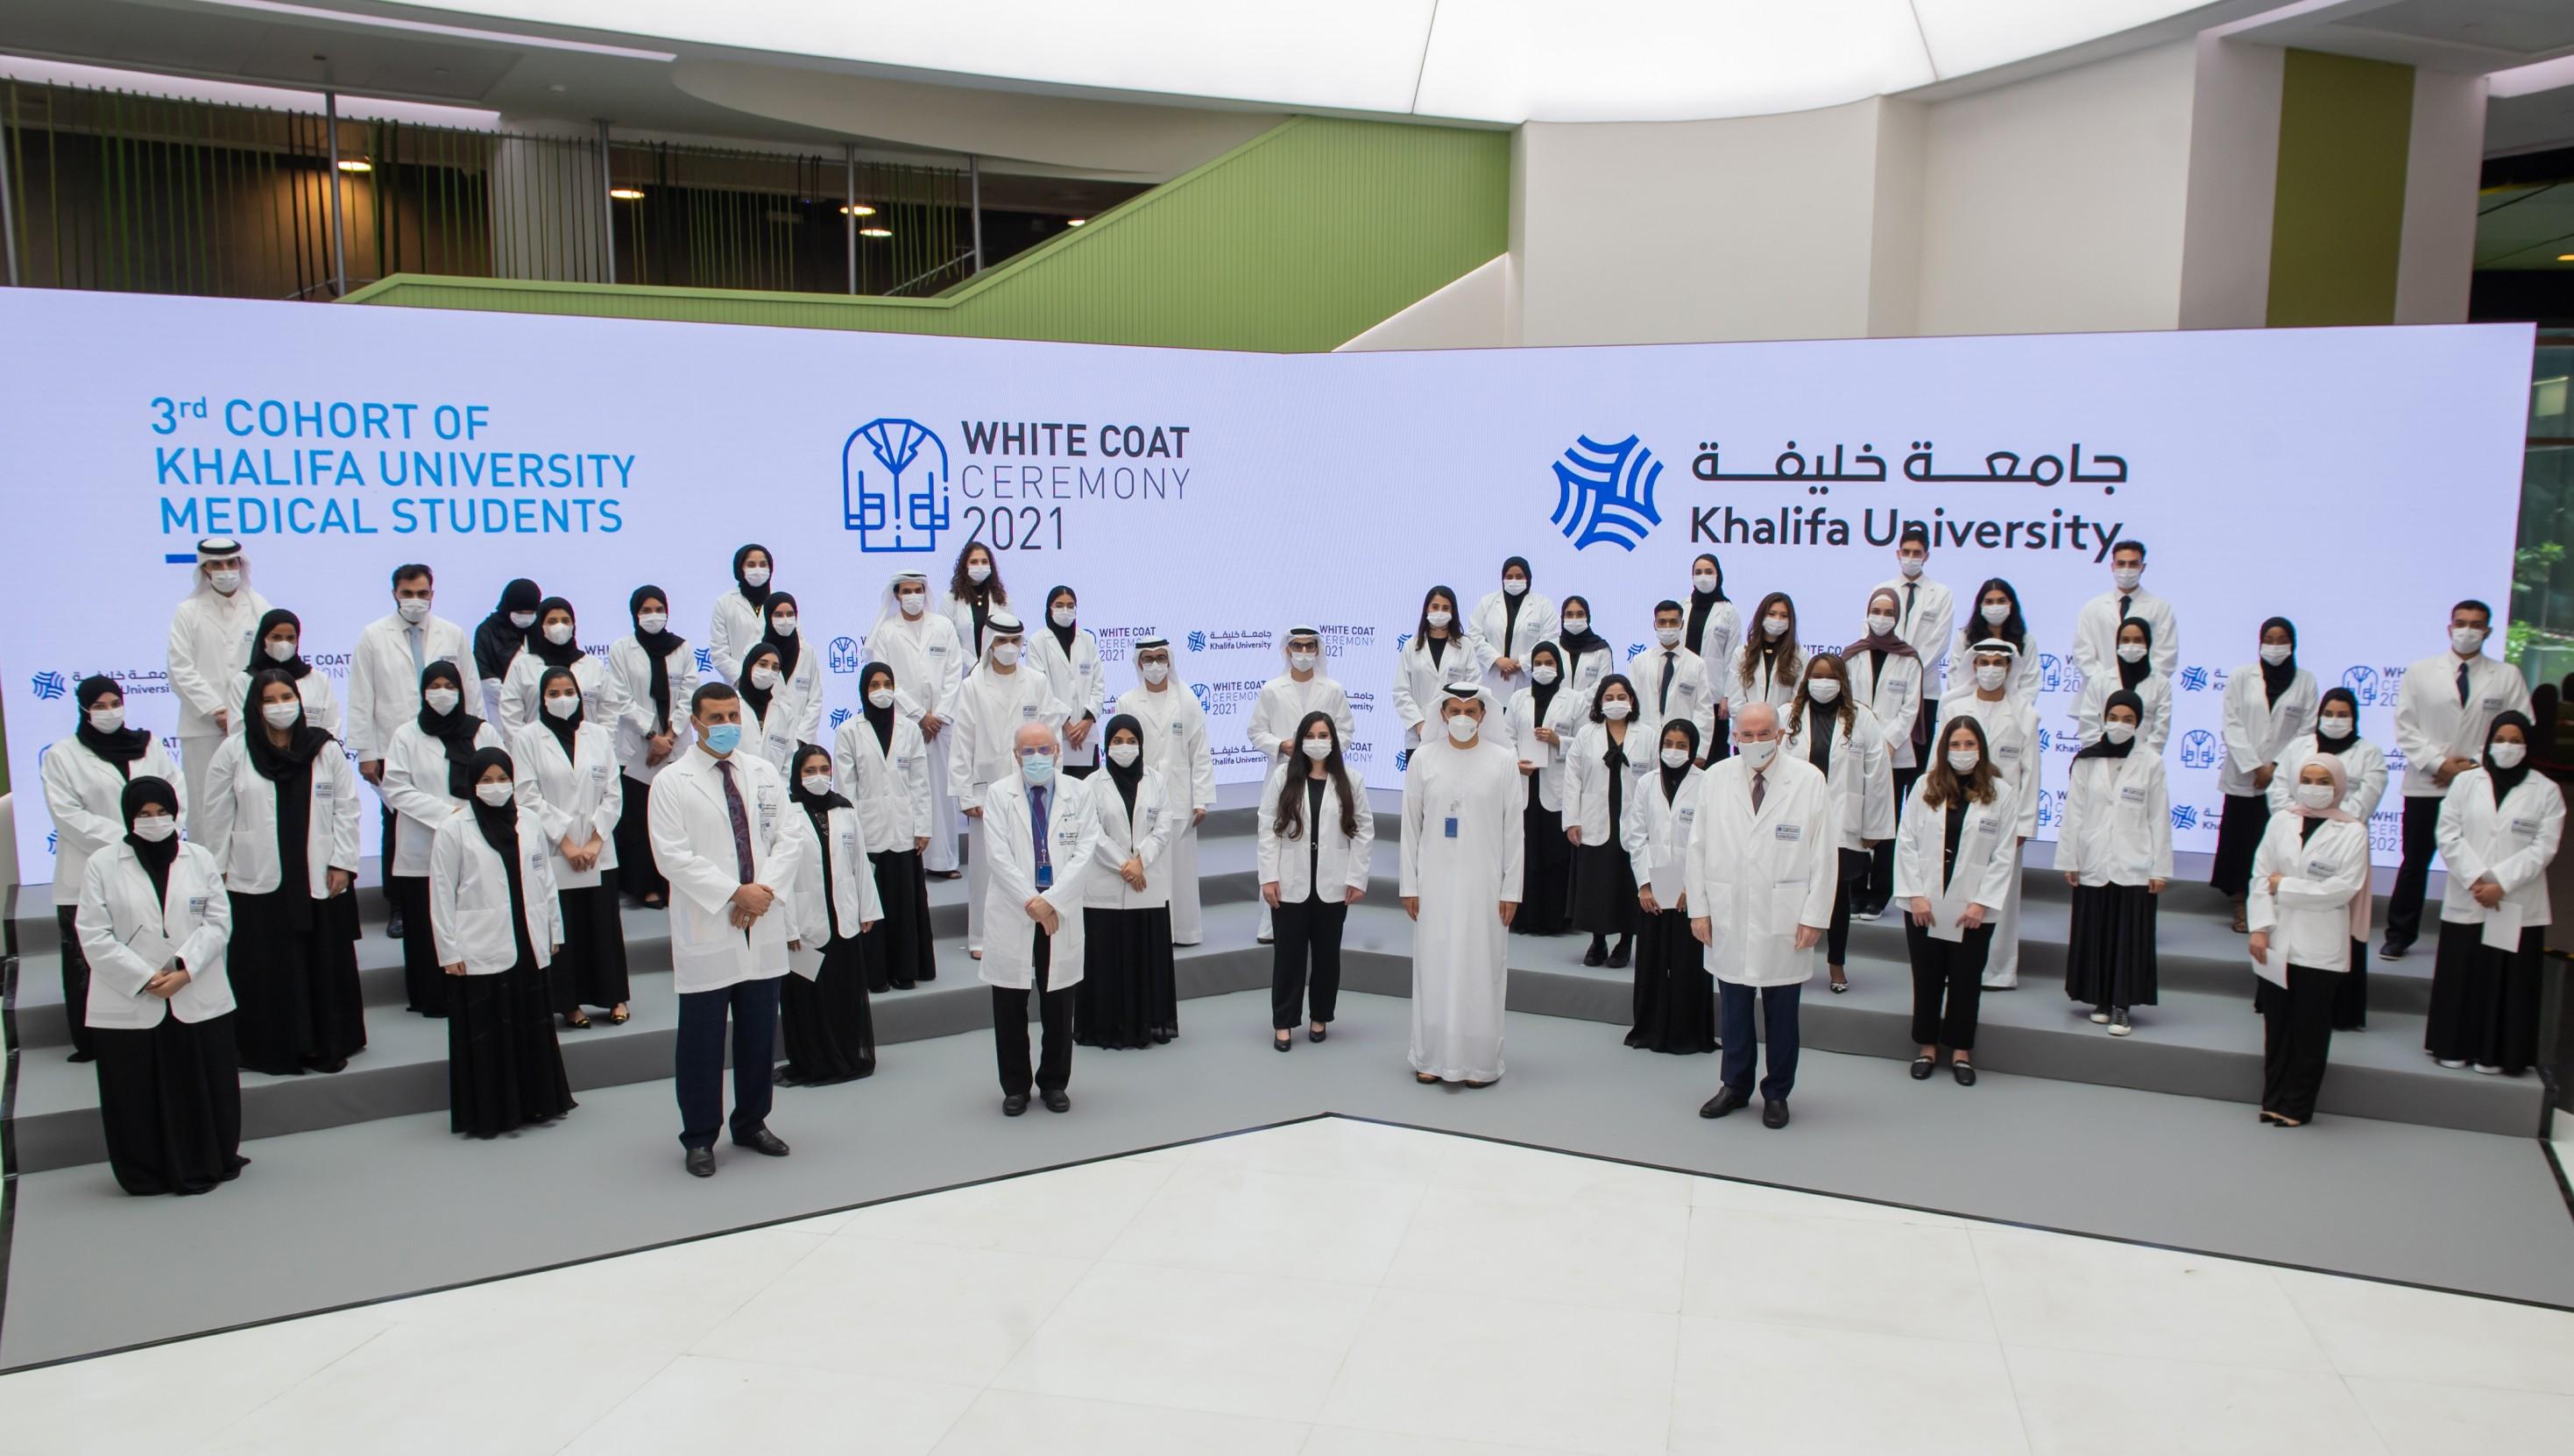 Khalifa University College of Medicine and Health Sciences Organizes White Coat Ceremony for Third Cohort of 49 Students